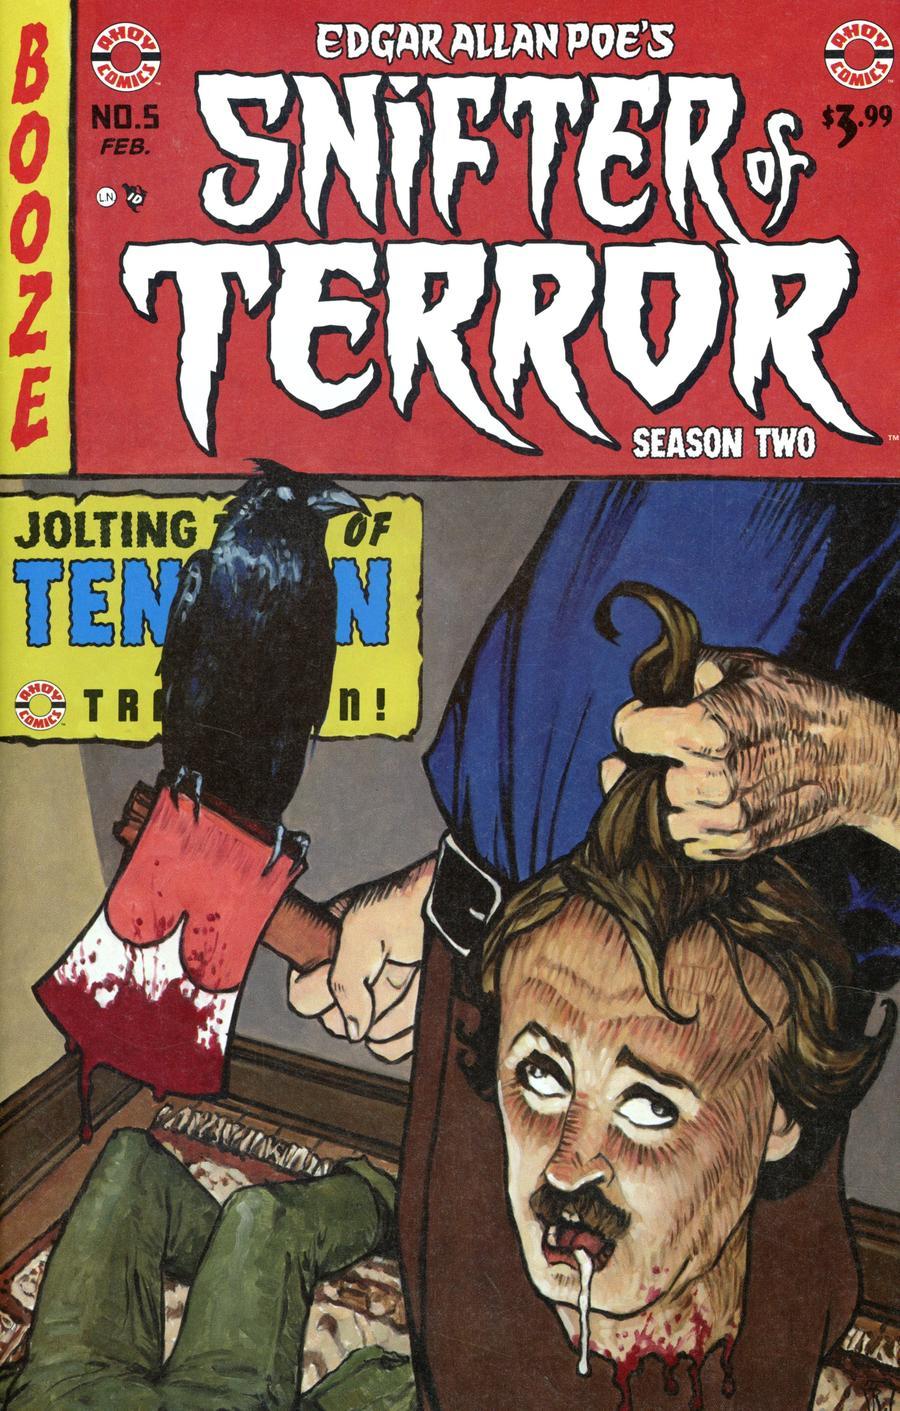 Edgar Allan Poes Snifter Of Terror Season 2 #5